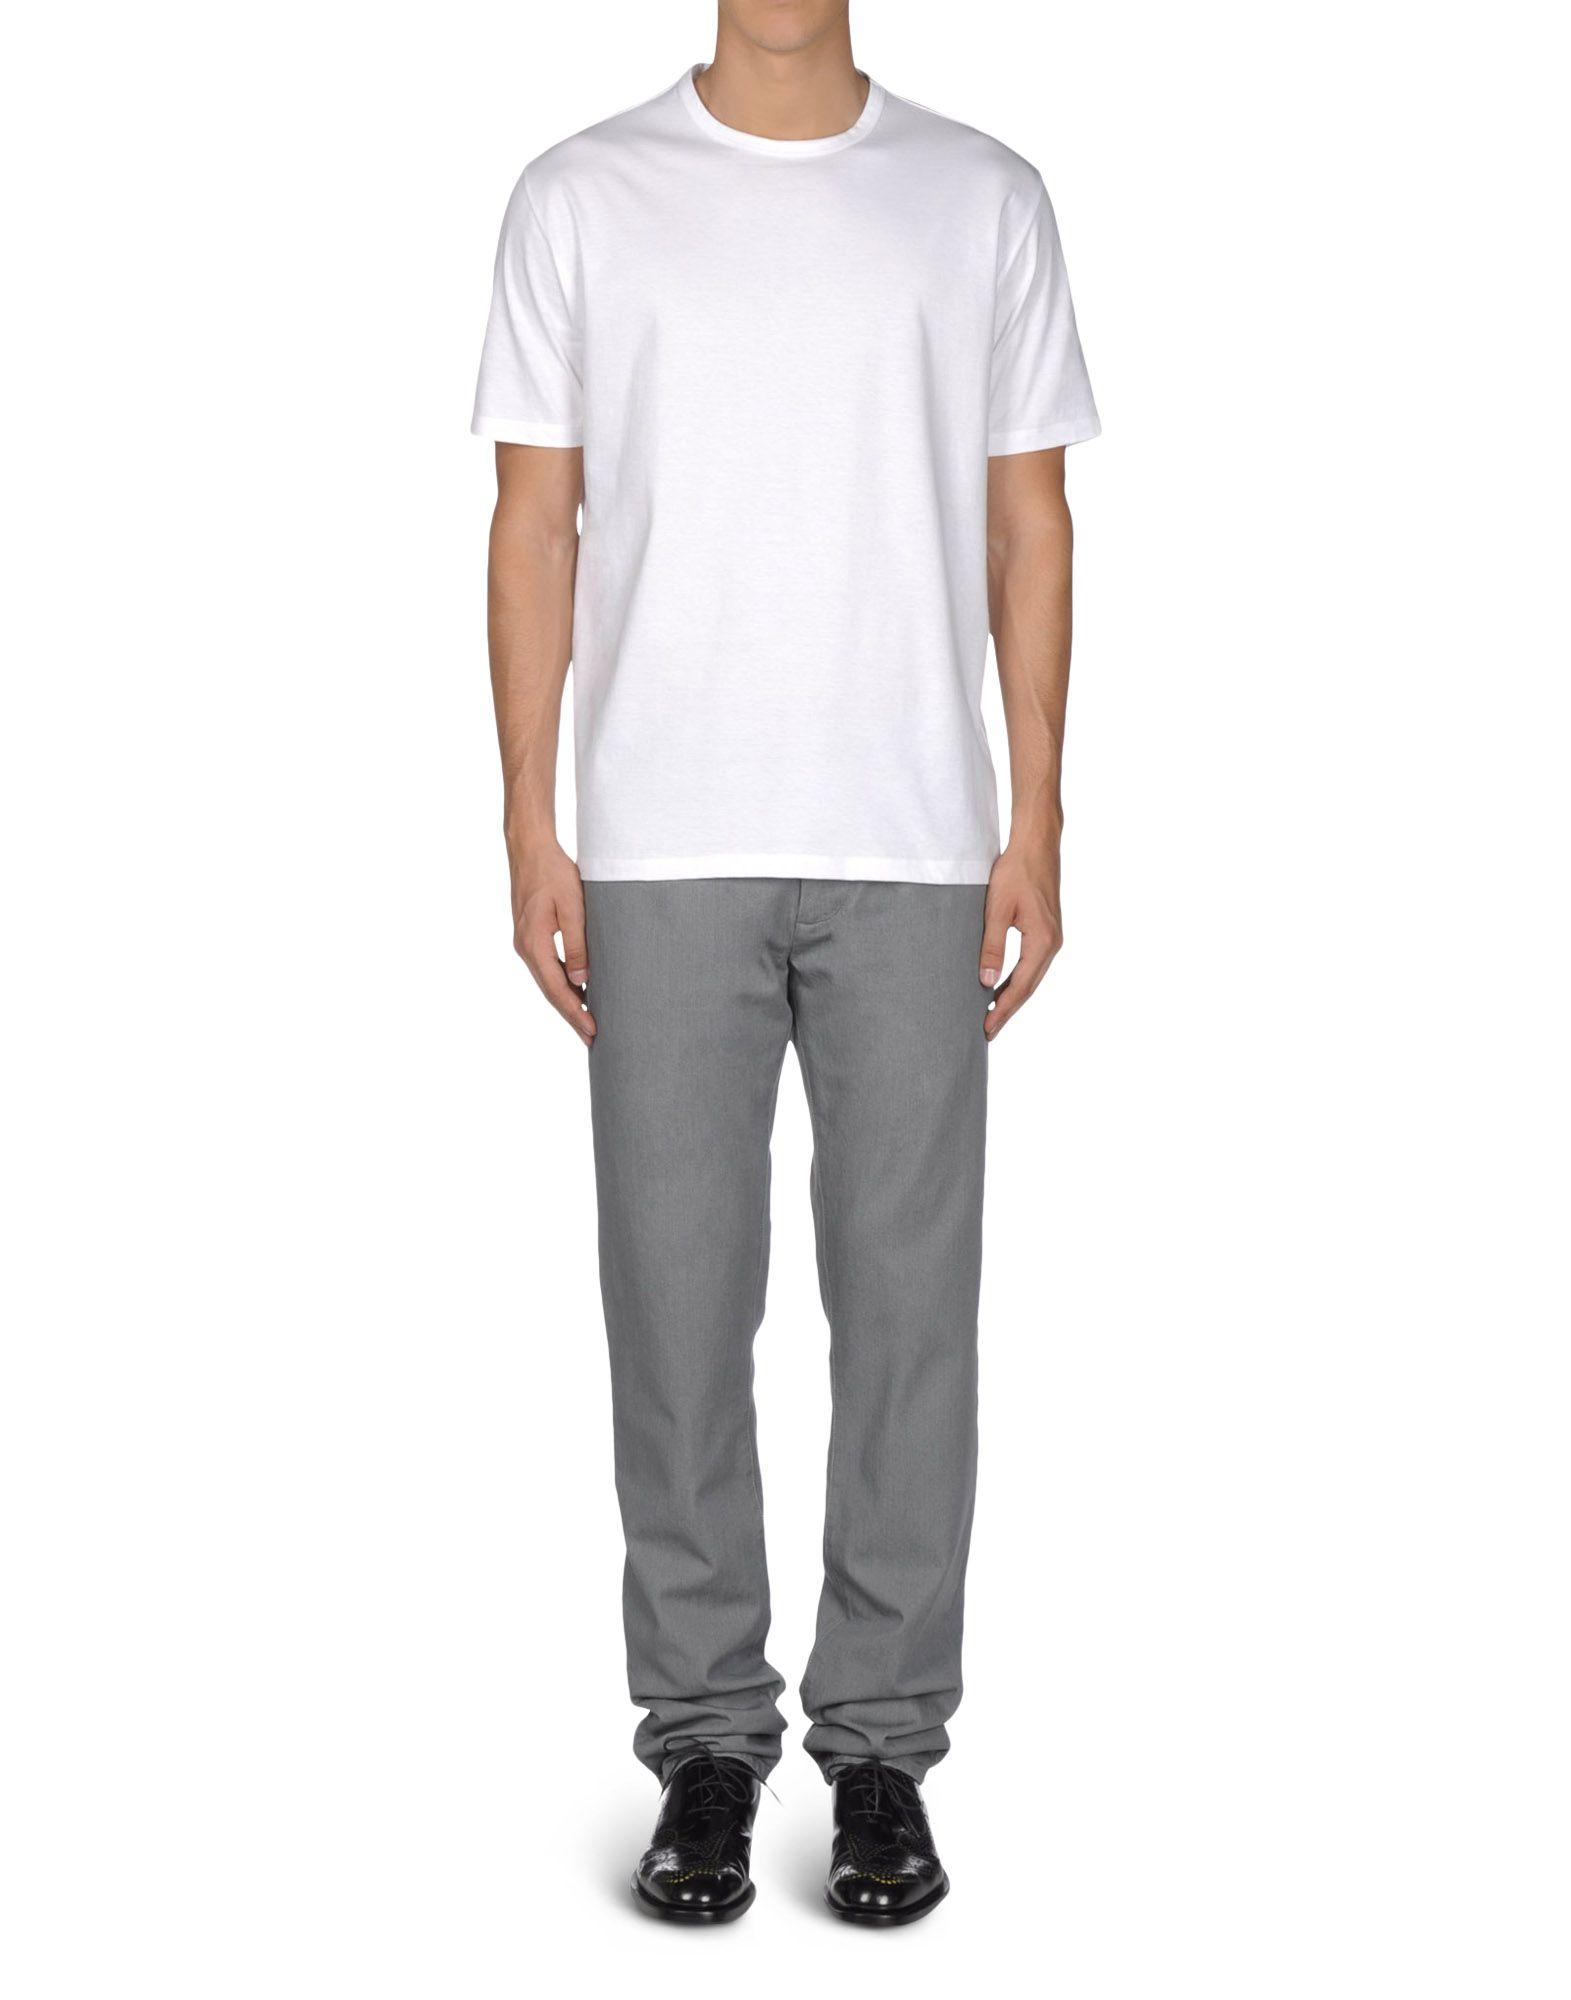 Jeans - JIL SANDER Online Store